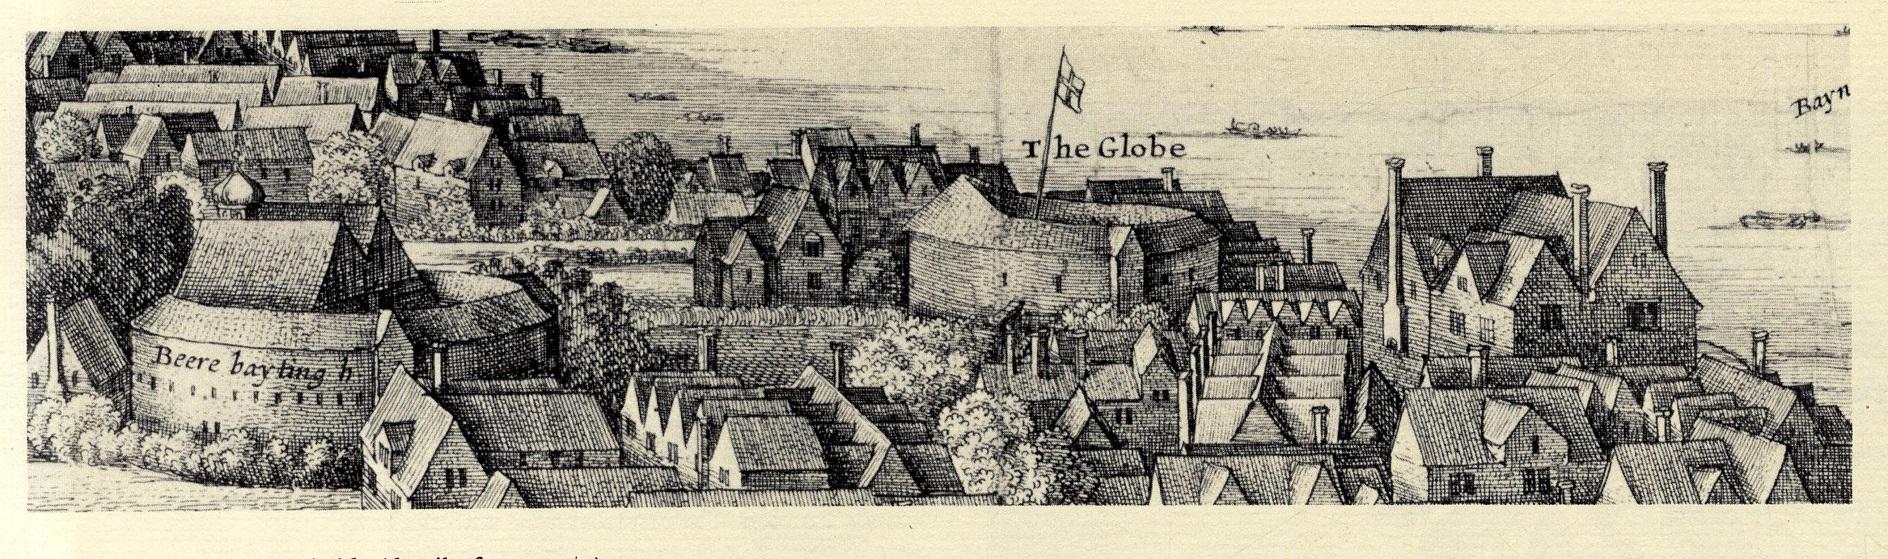 shakespeares-globe-theatre-image.jpg